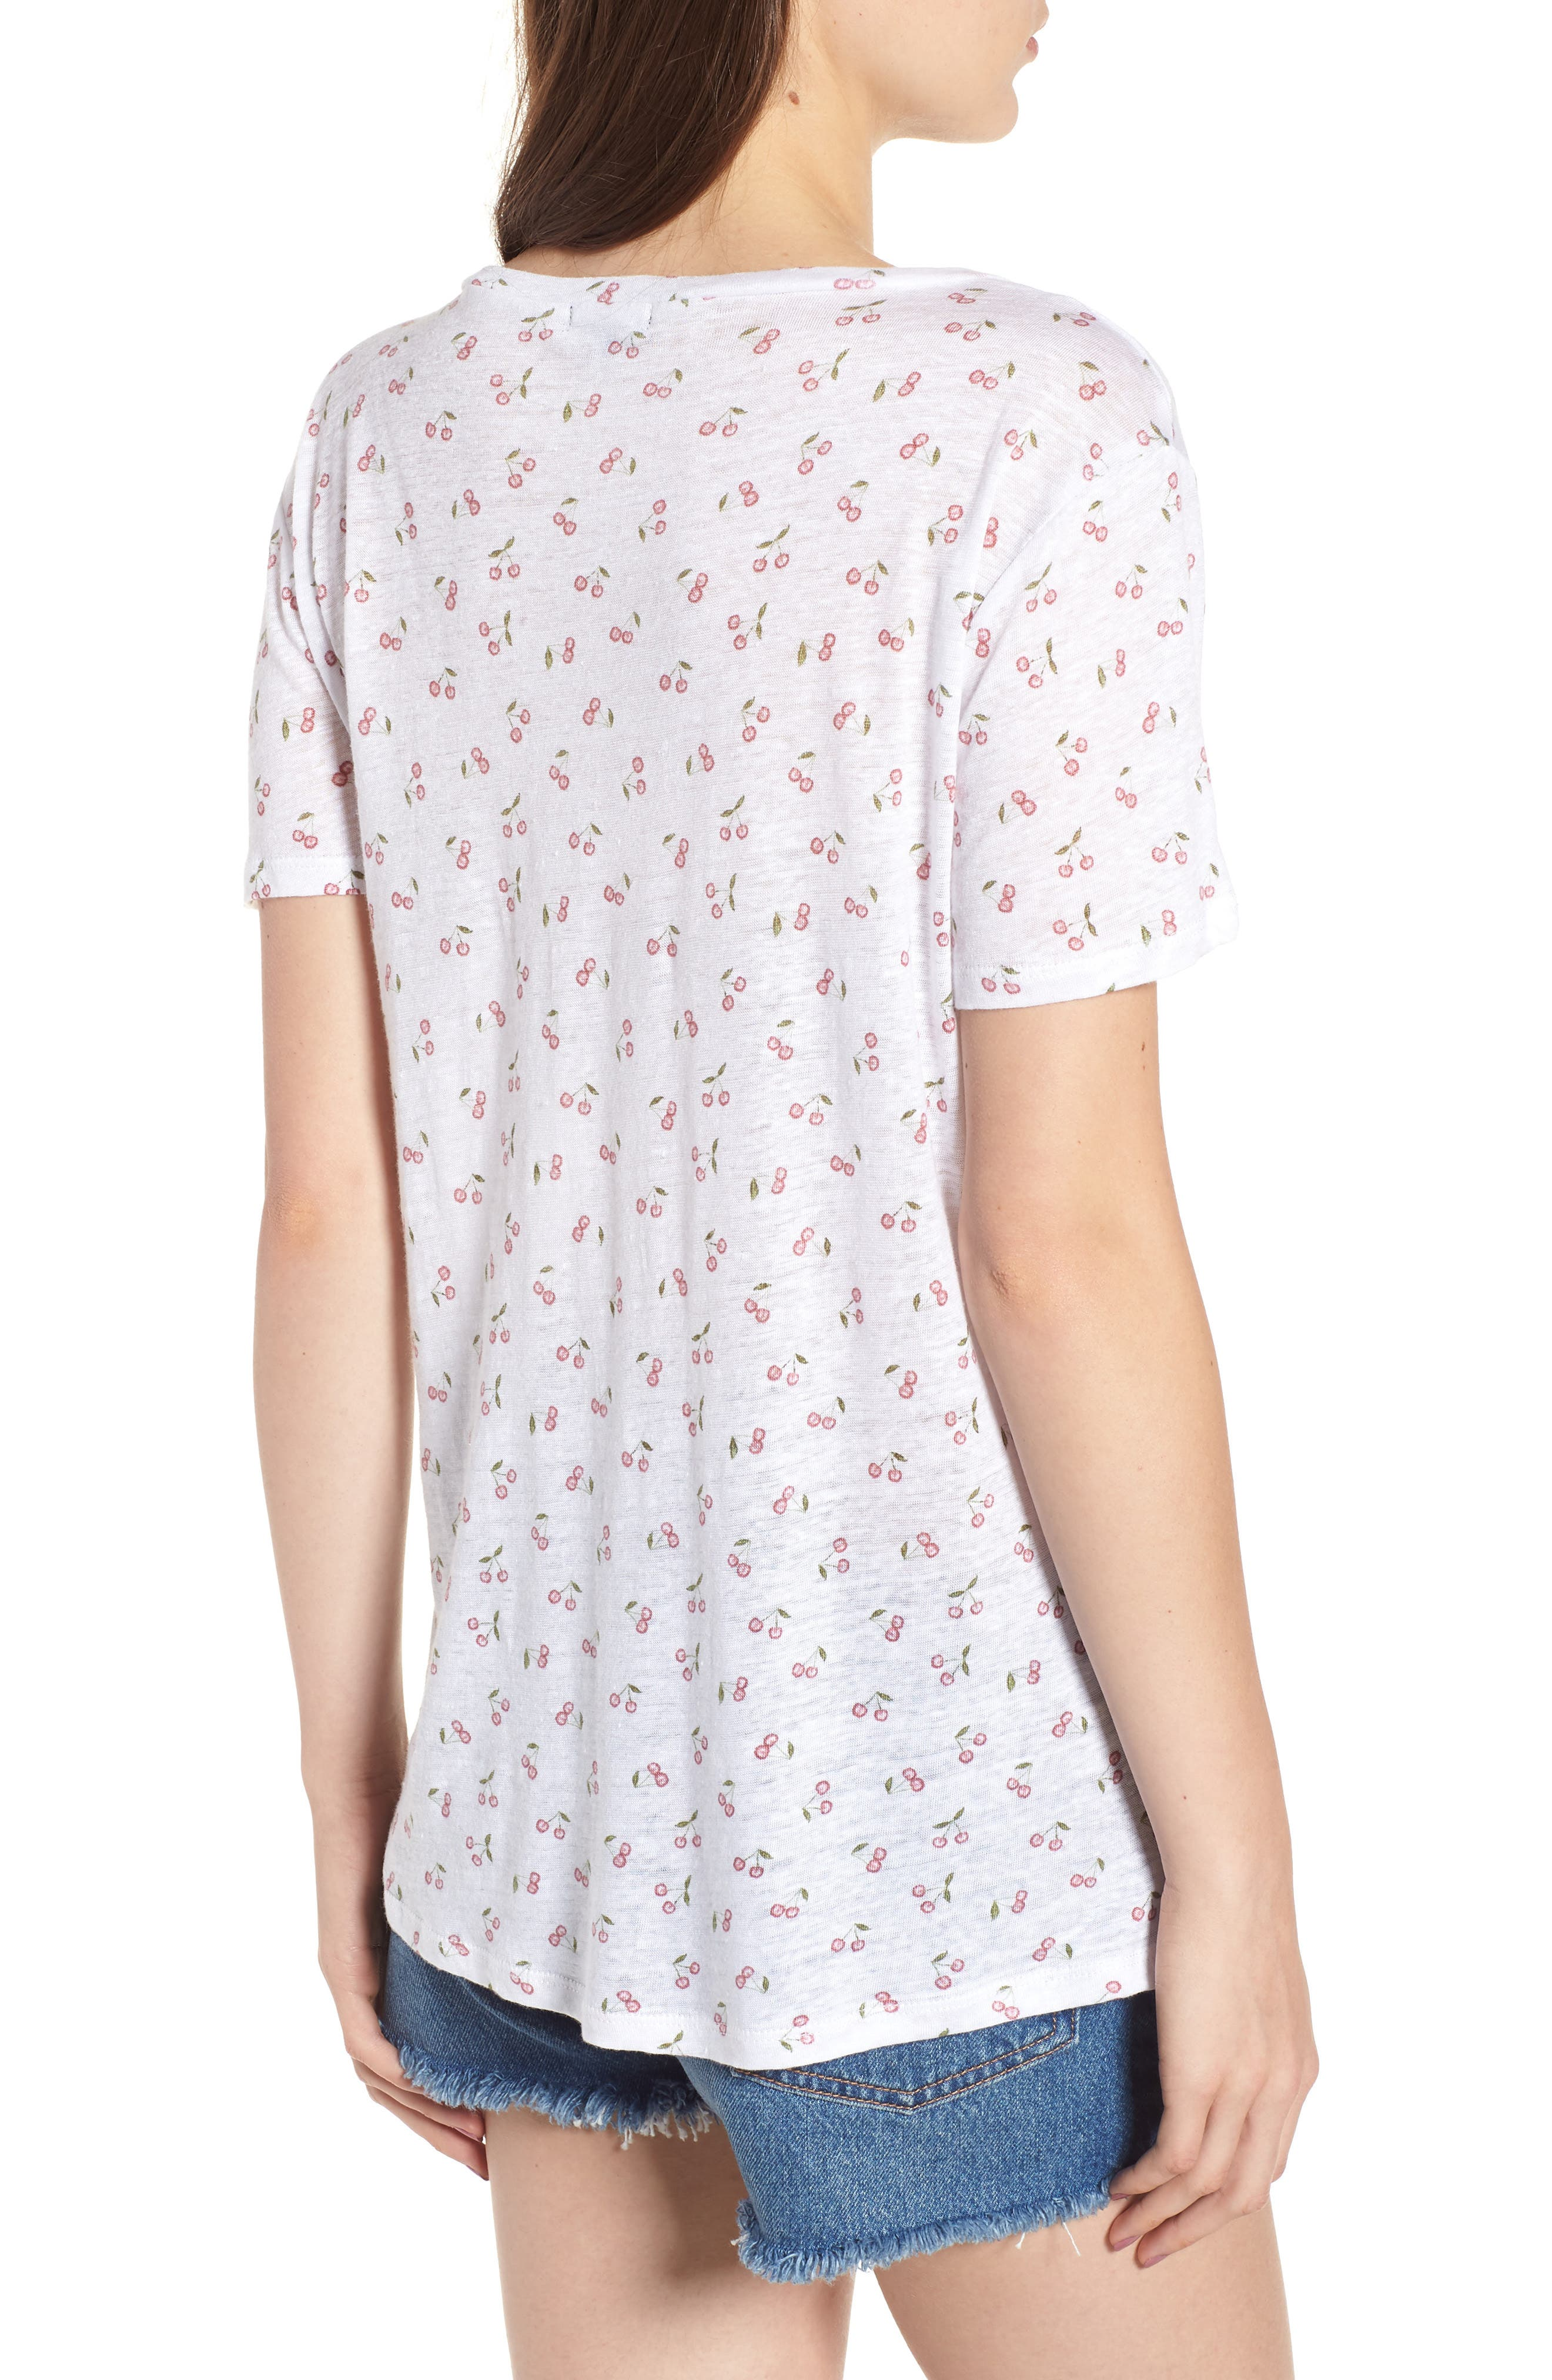 Cara V-Neck Slub Knit Tee,                             Alternate thumbnail 2, color,                             White Cherries